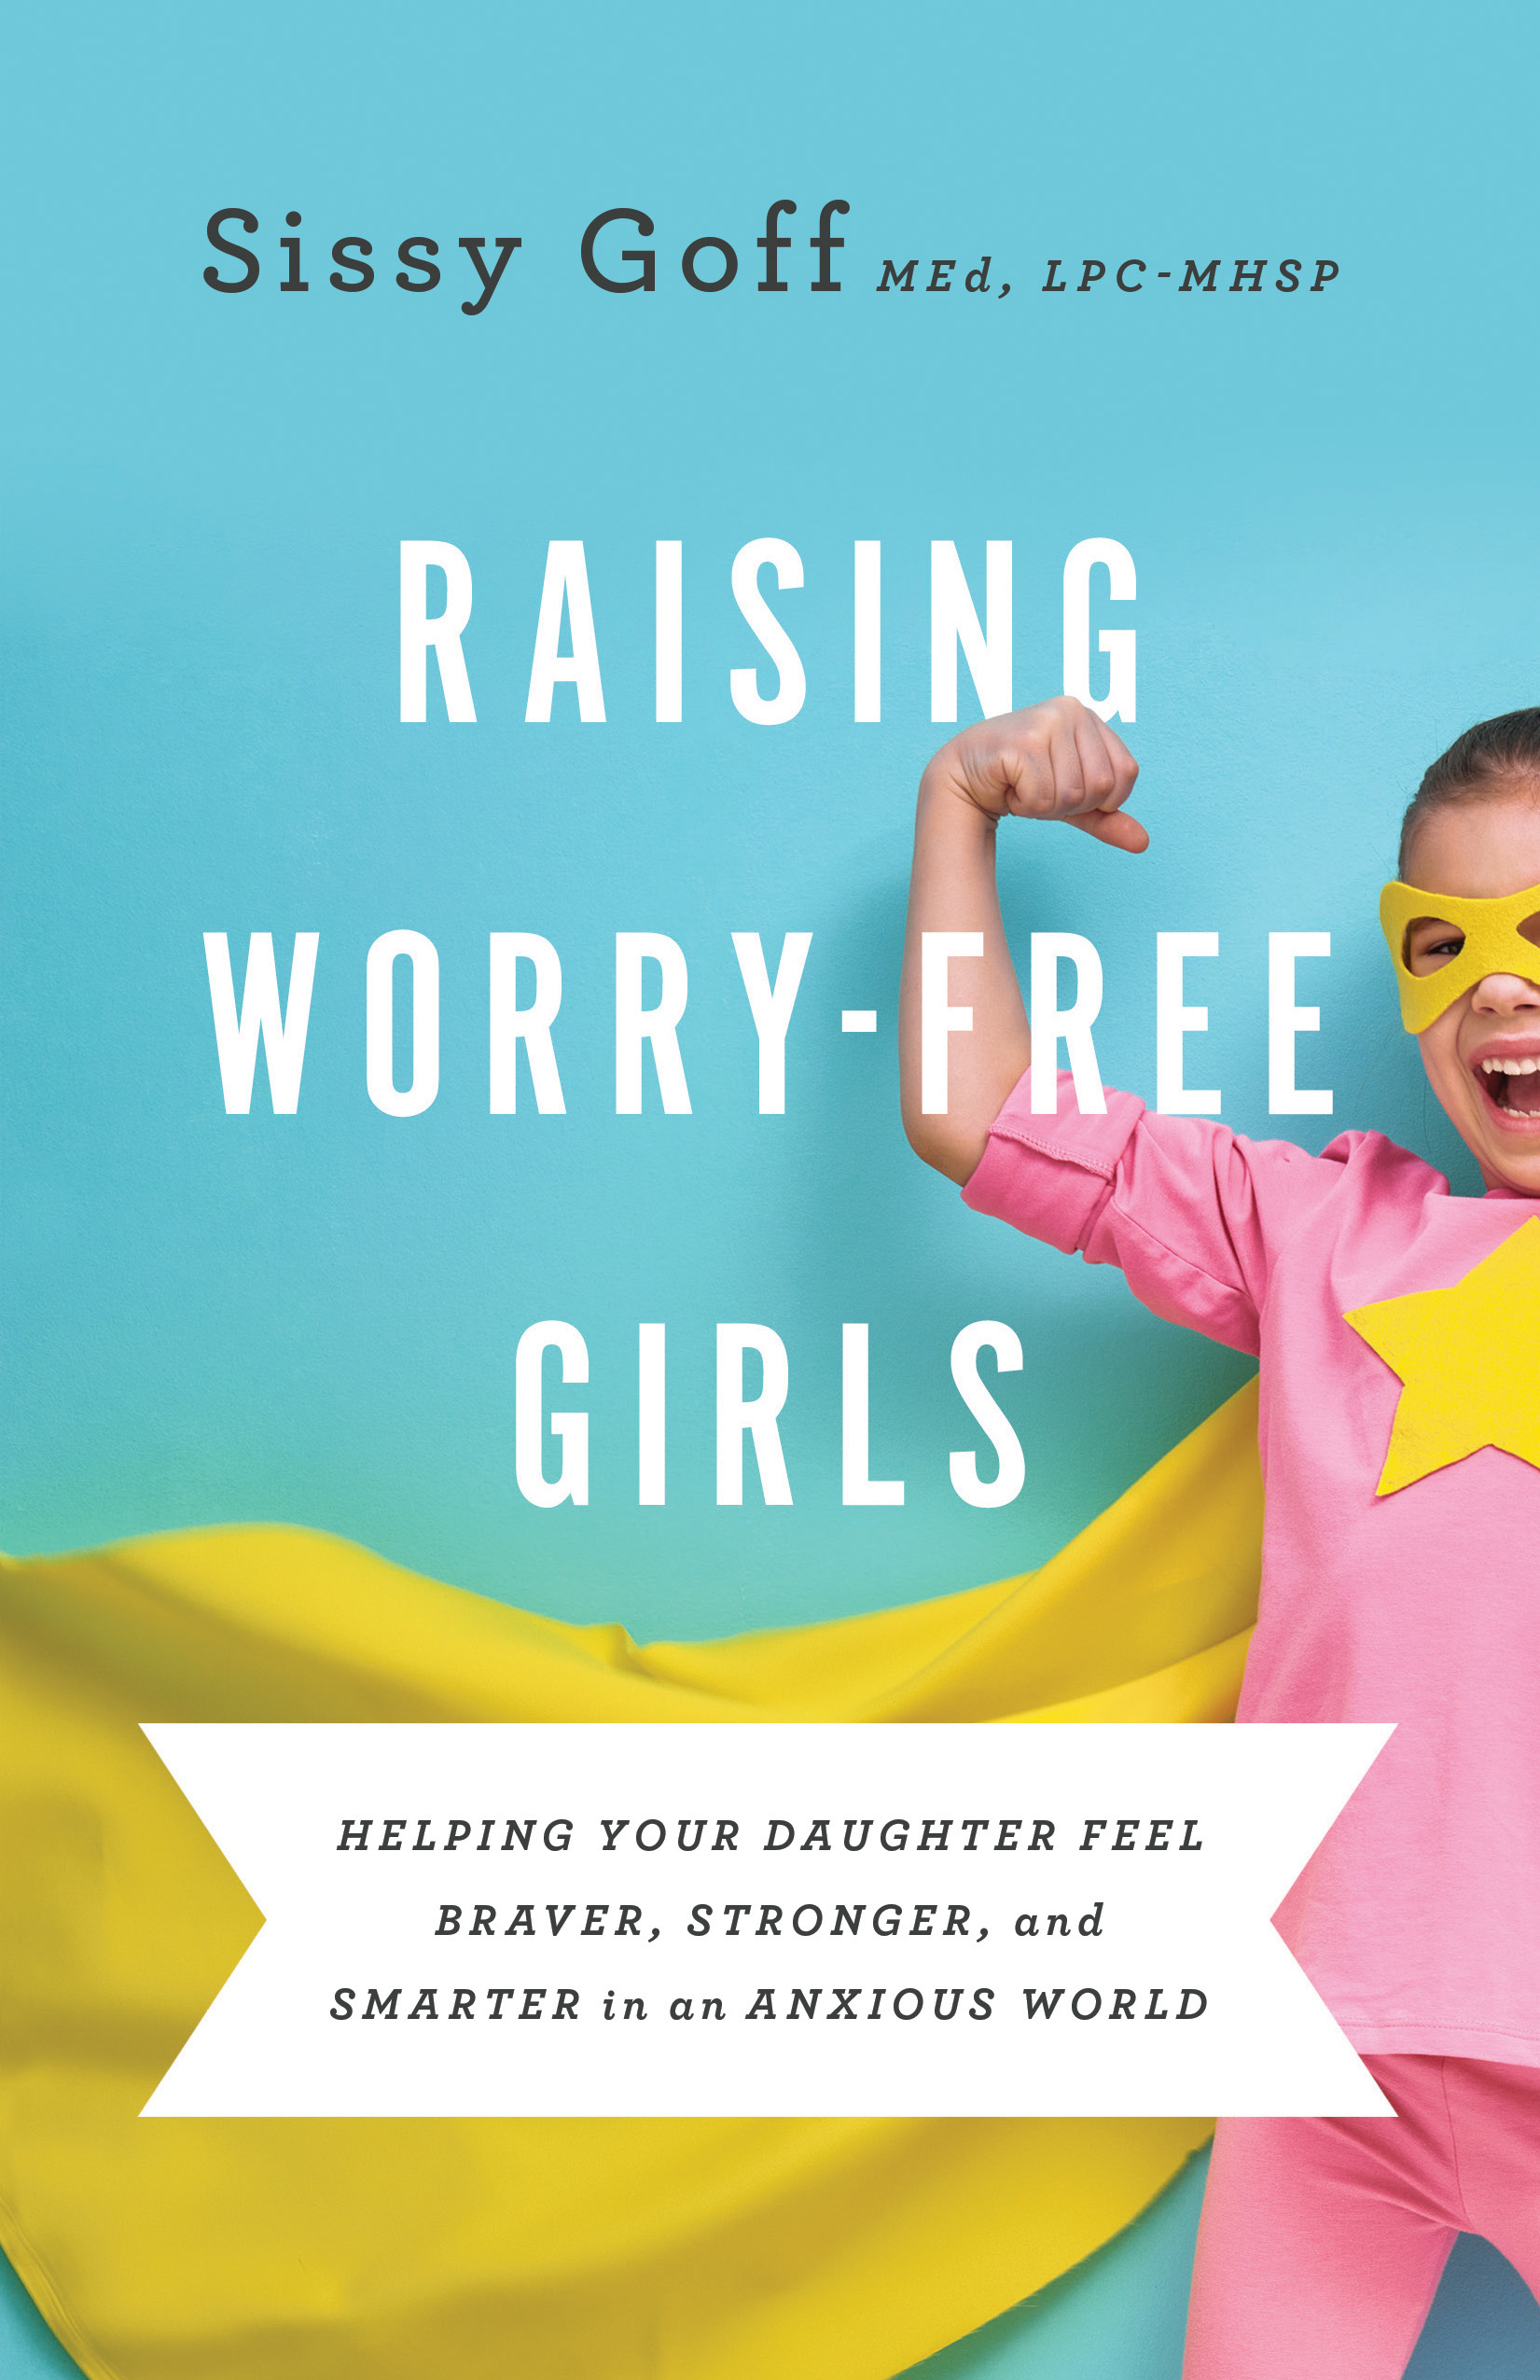 RaisingWorryFreeGirls_300rgbMck.jpg